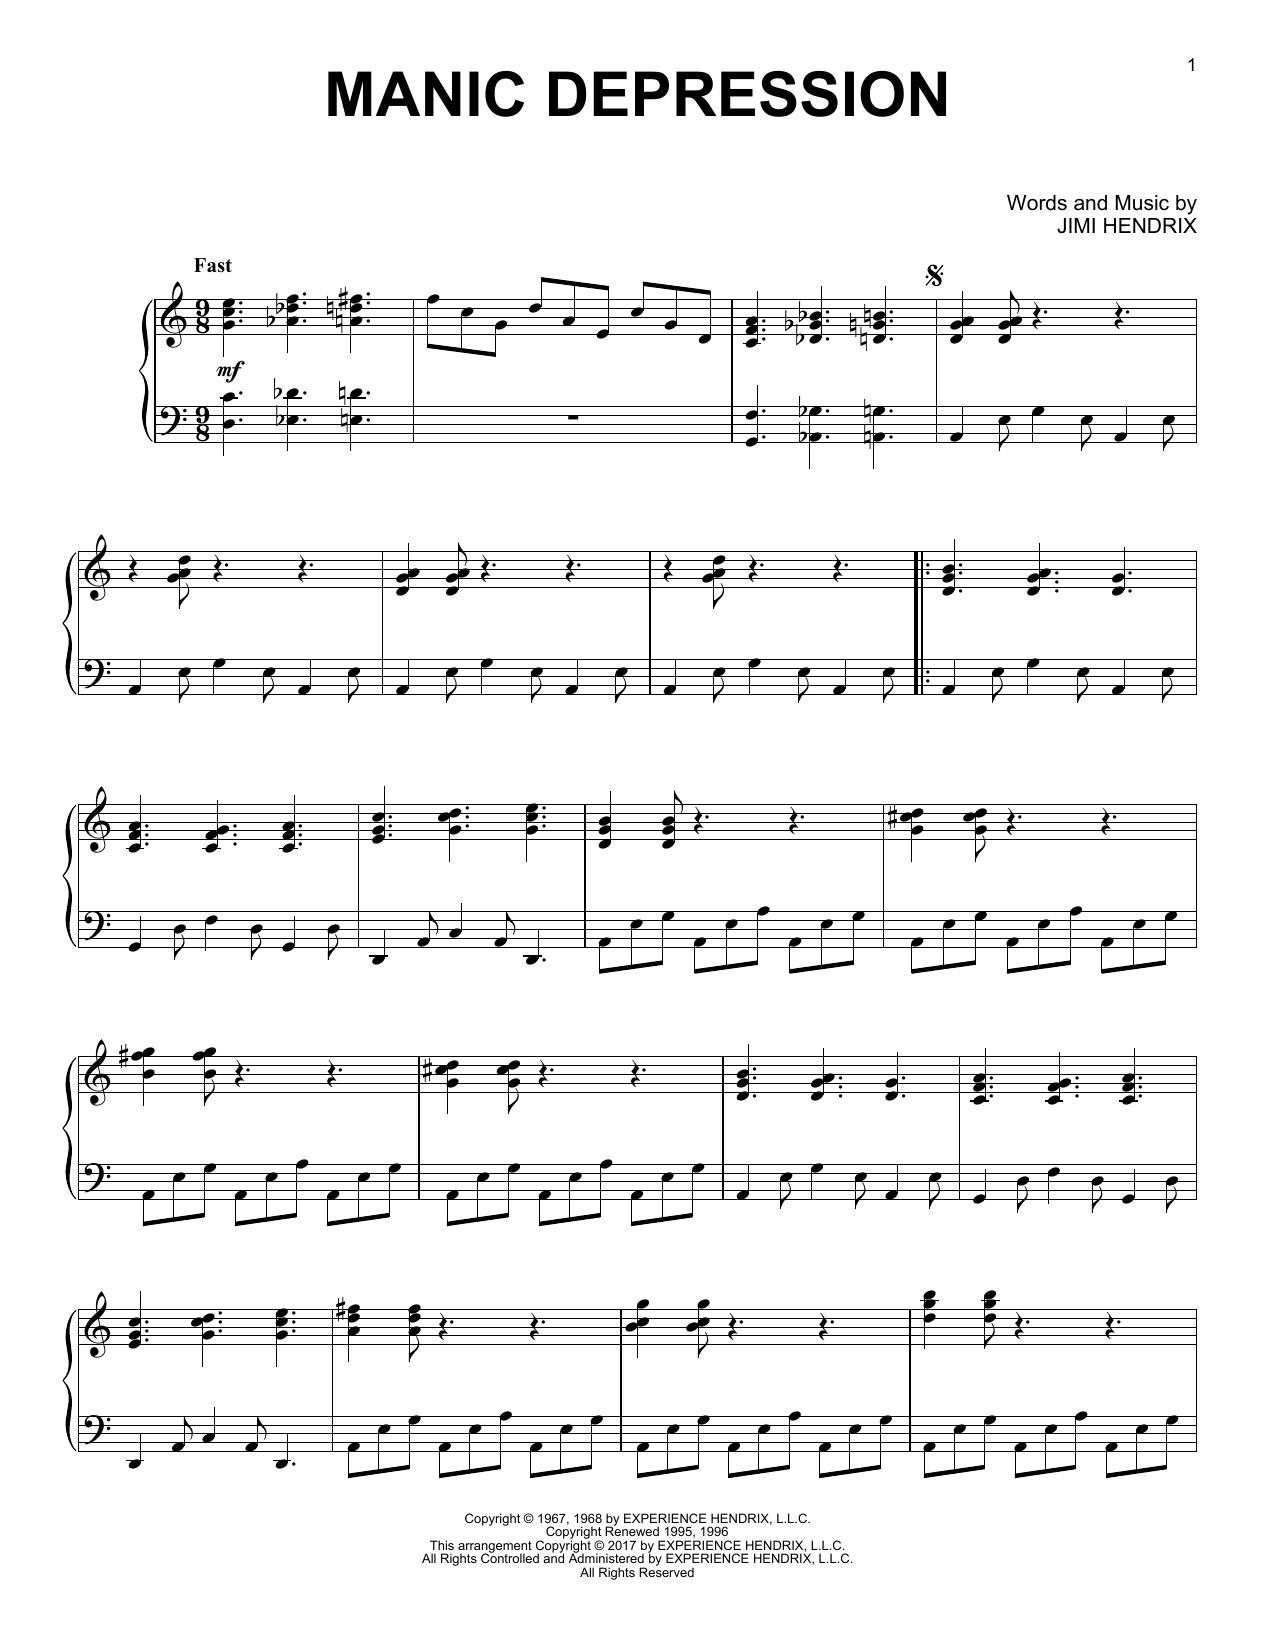 Jimi Hendrix Manic Depression [Jazz version] sheet music notes and chords. Download Printable PDF.